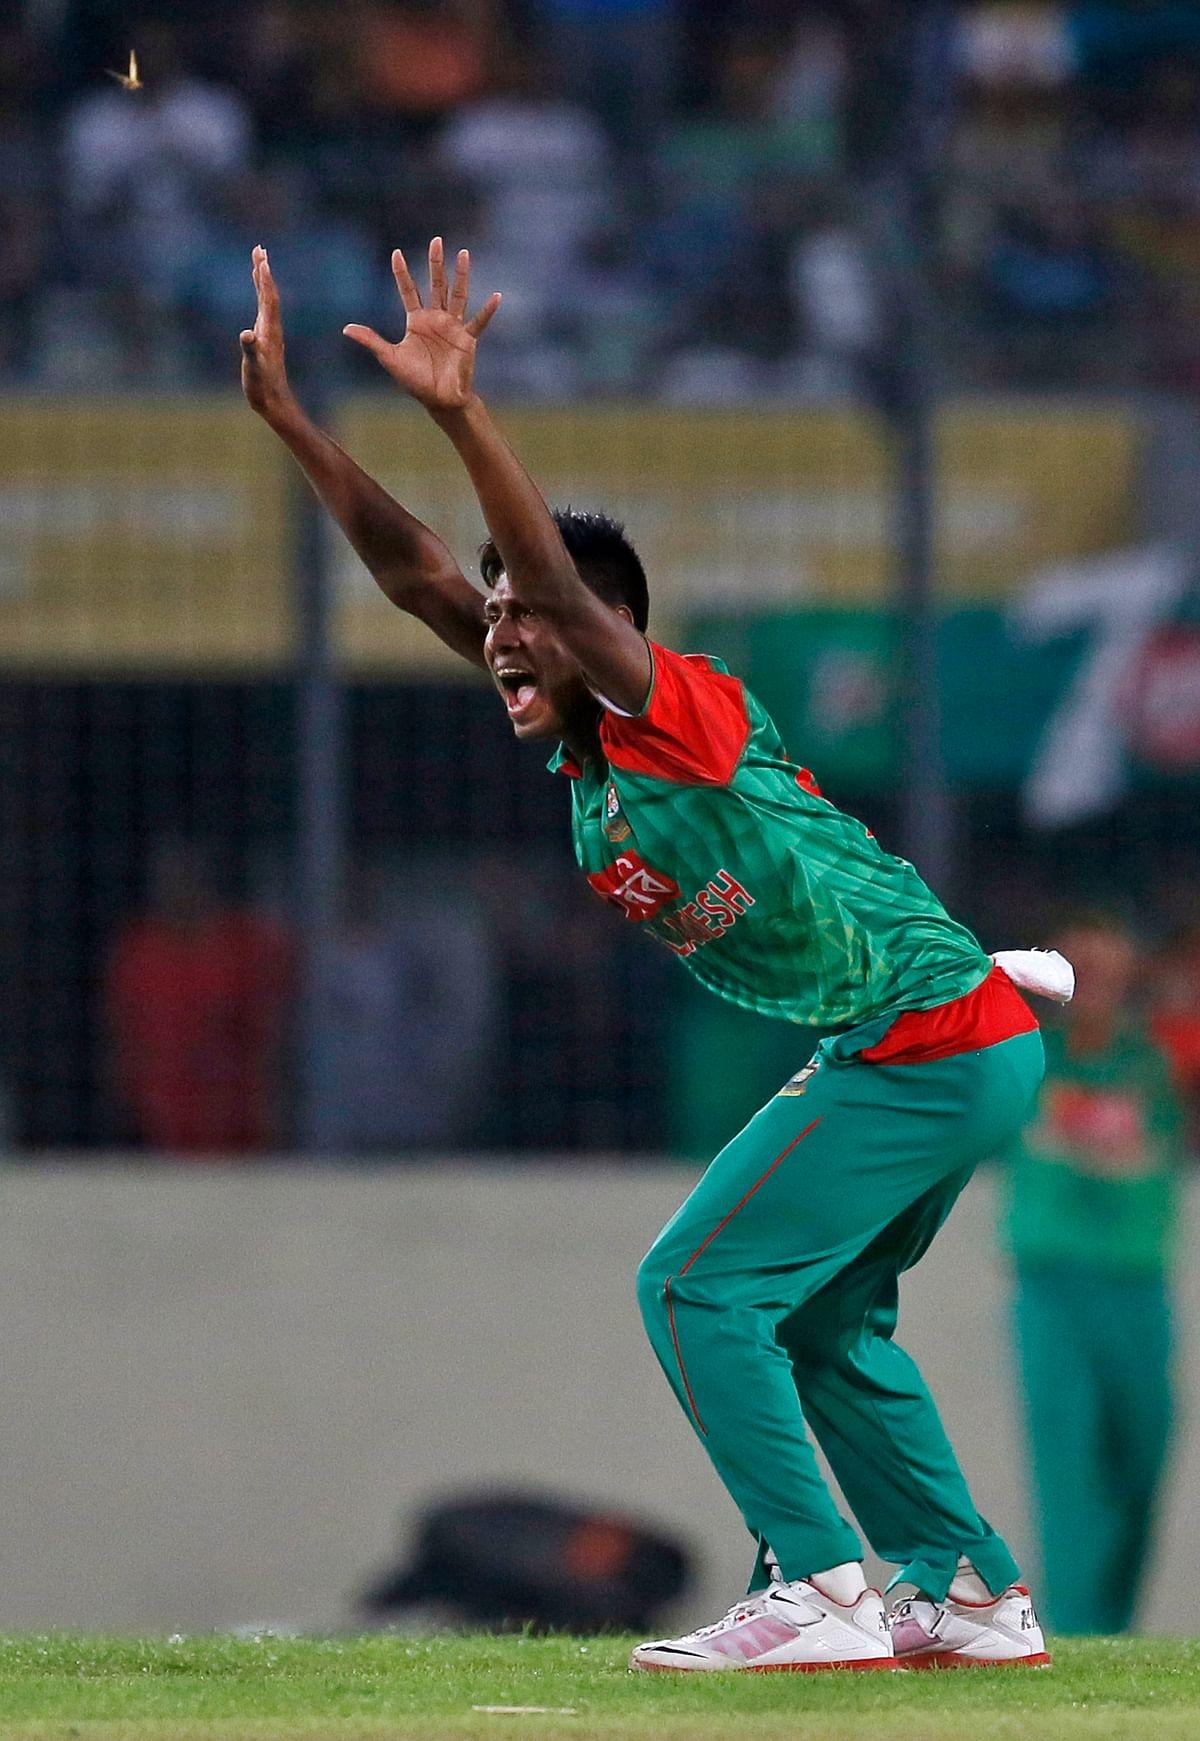 Bangladesh's Mustafizur Rahmancelebrates the dismissal of India's Rohit Sharma.